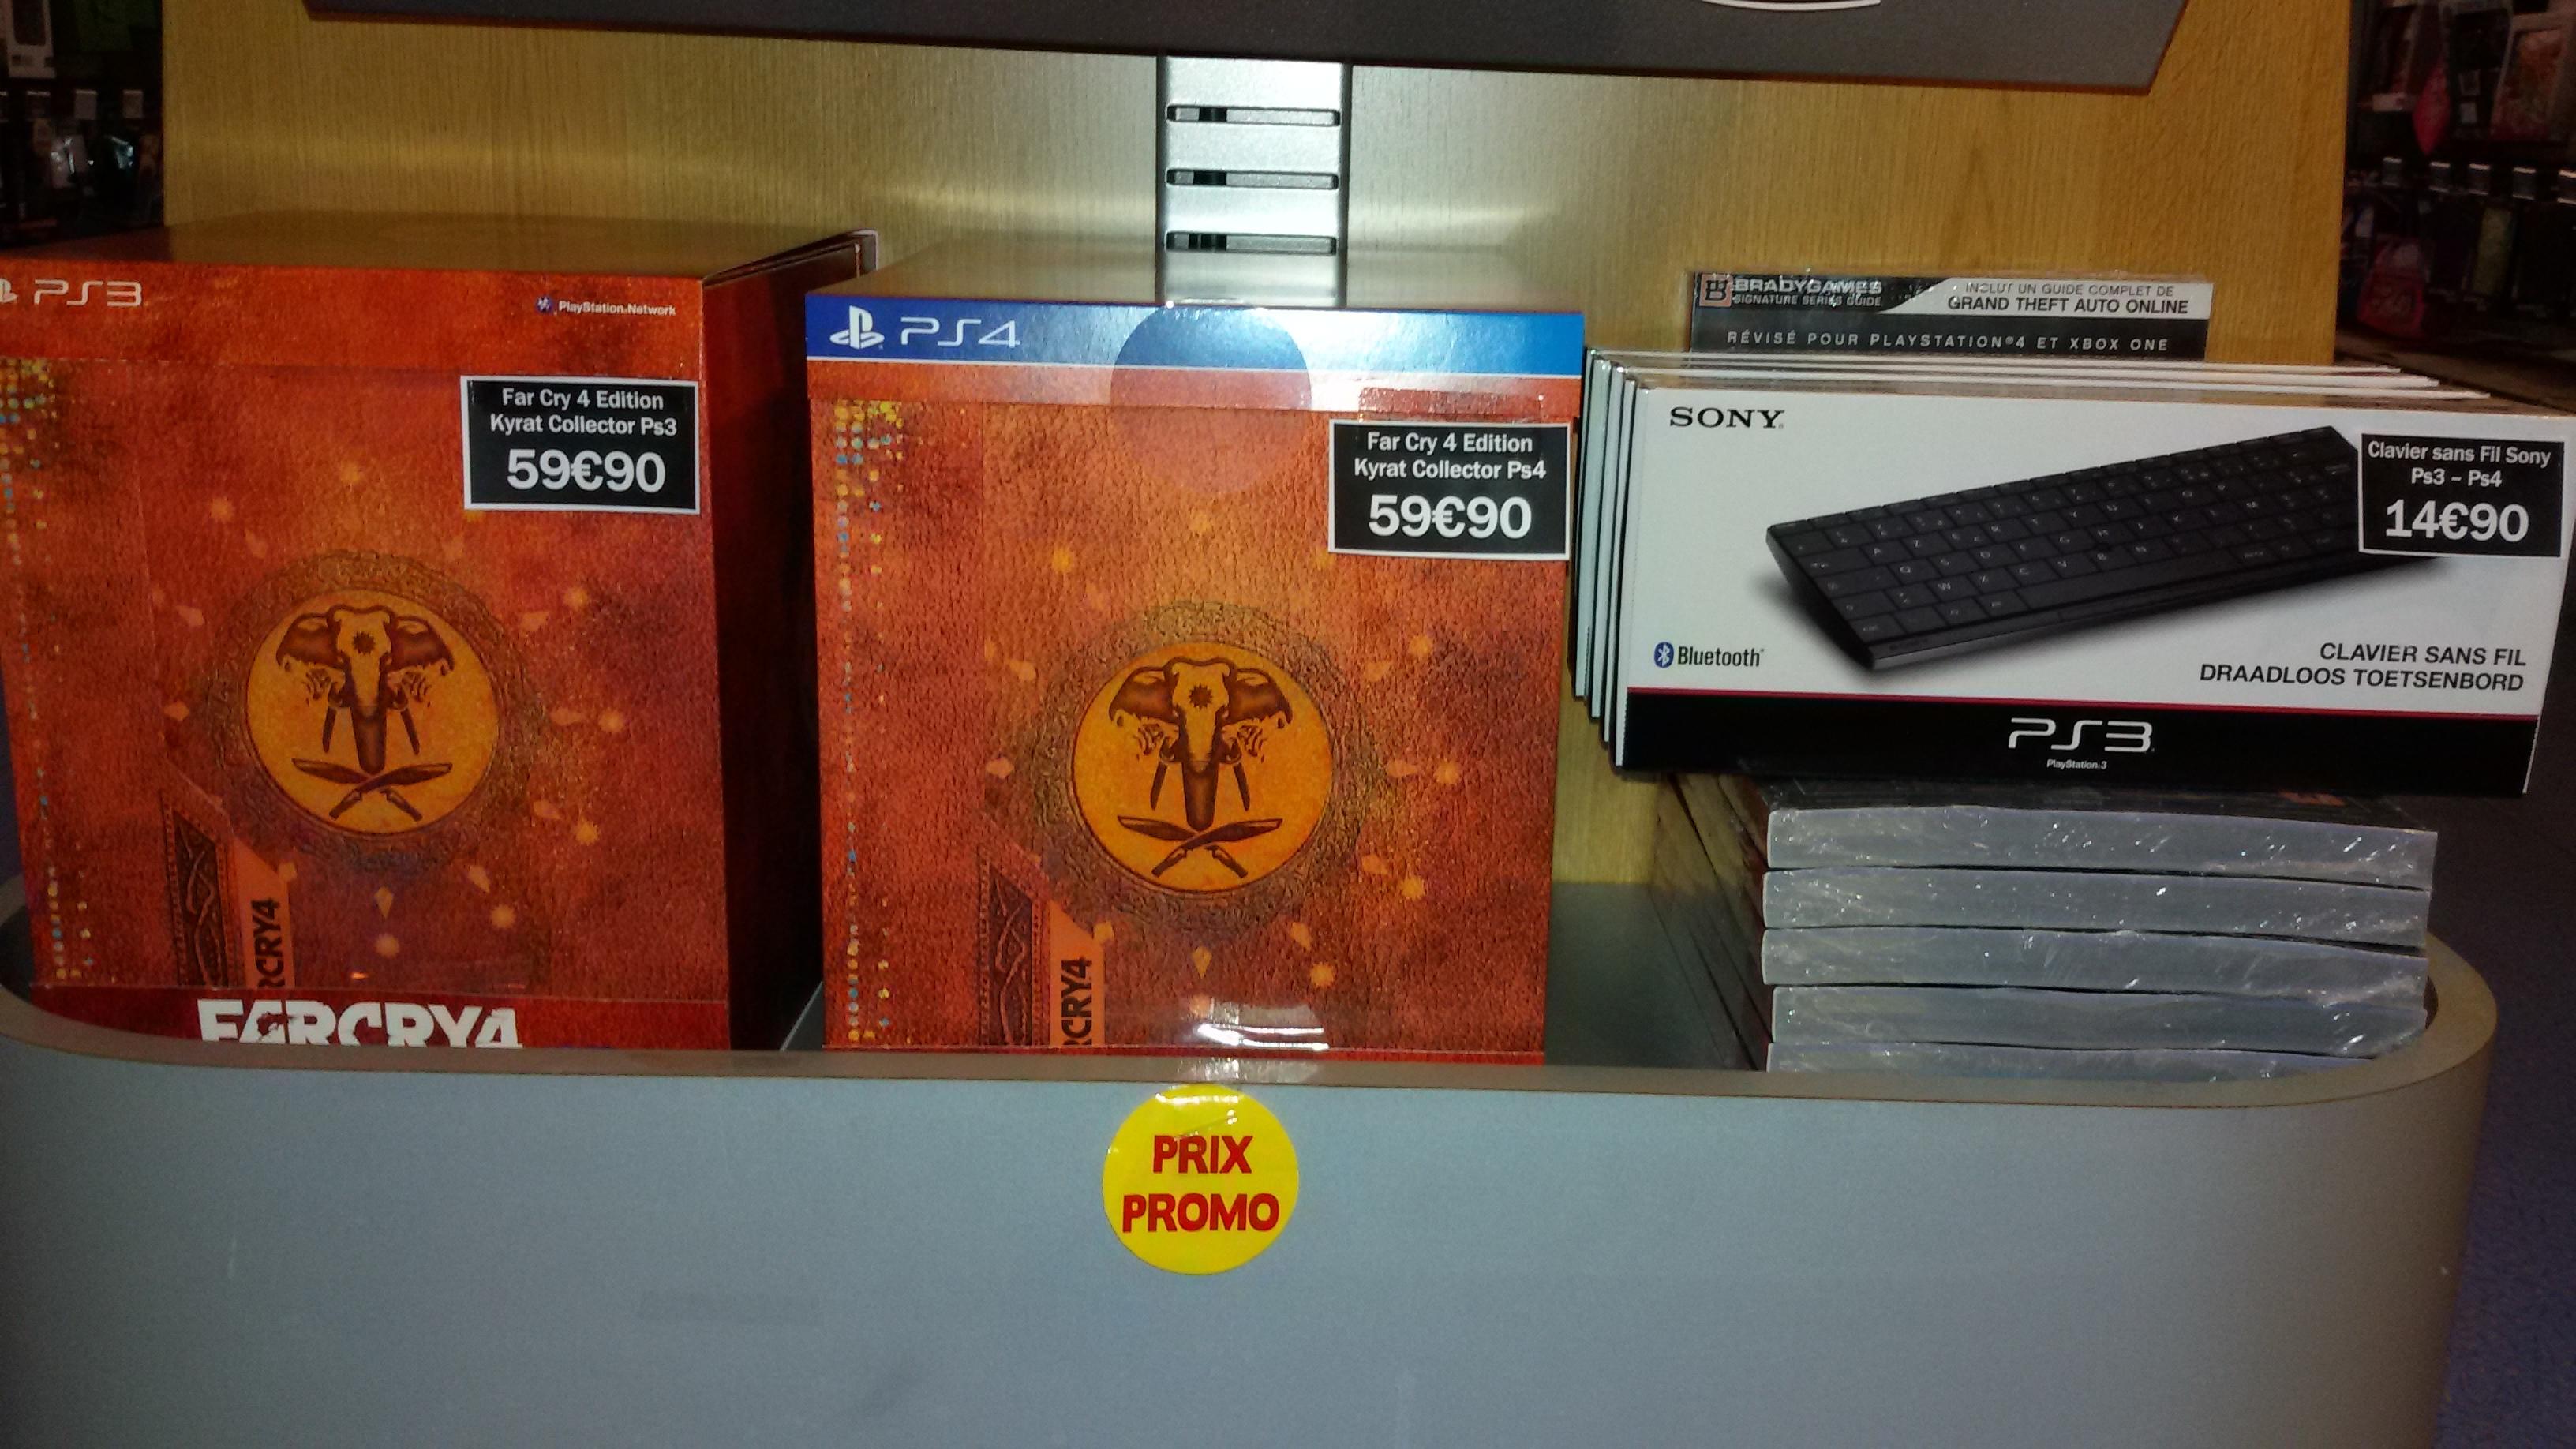 Far Cry 4 - Edition collector Kyrat sur PS4, PS3 et PC